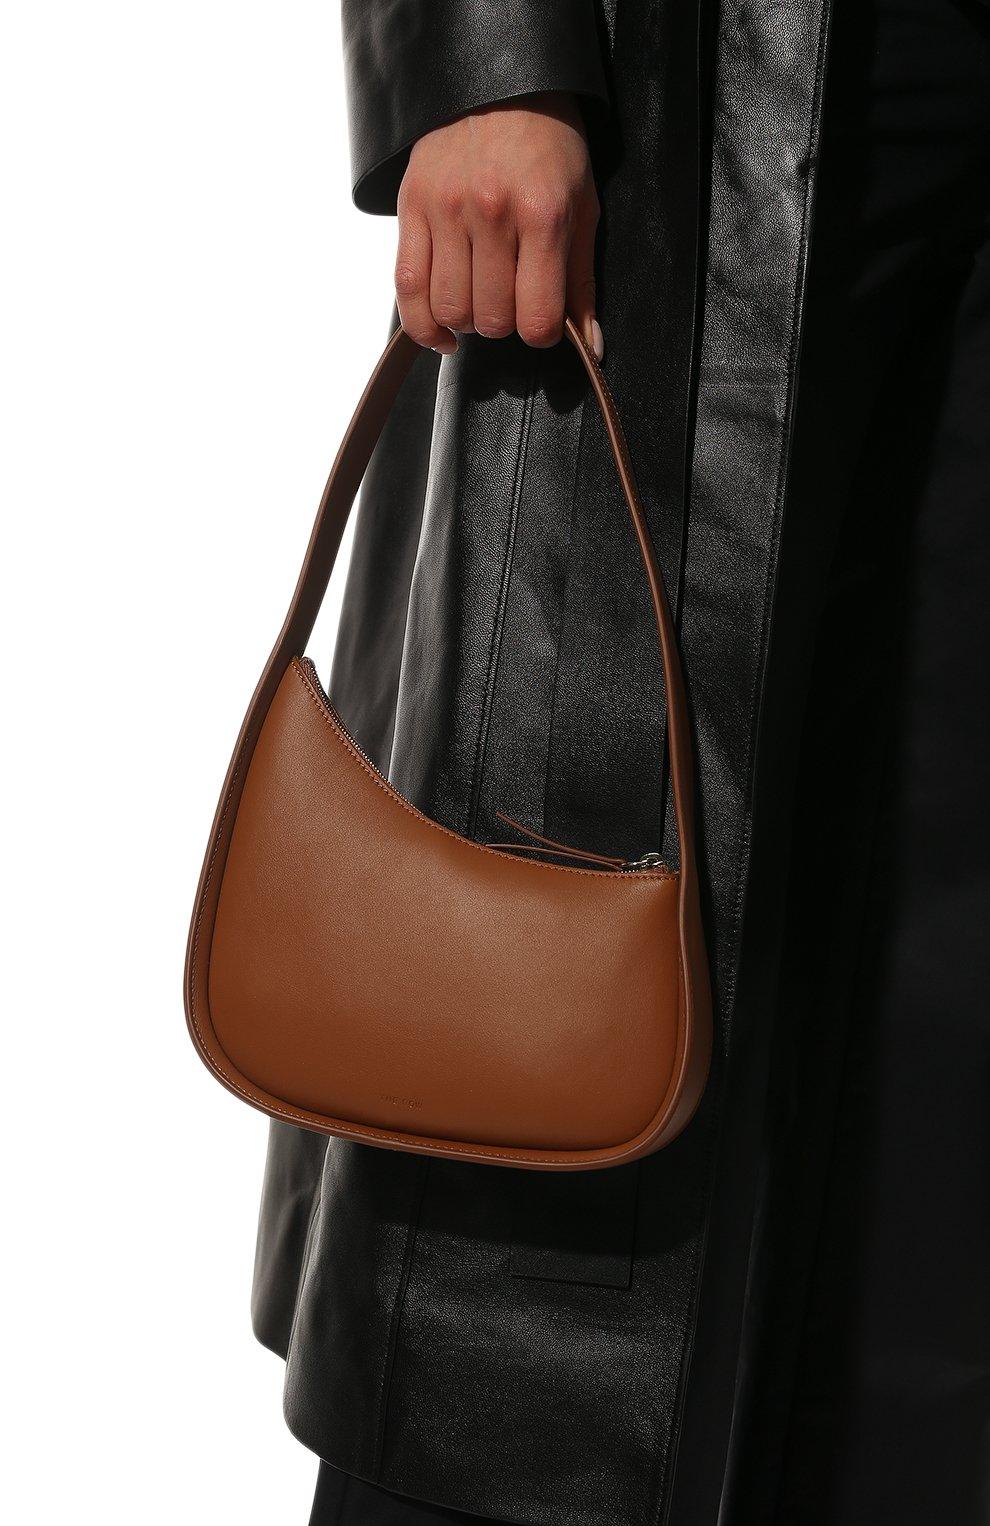 Женская сумка half moon THE ROW коричневого цвета, арт. W1249L52   Фото 2 (Сумки-технические: Сумки top-handle; Материал: Натуральная кожа; Размер: mini)